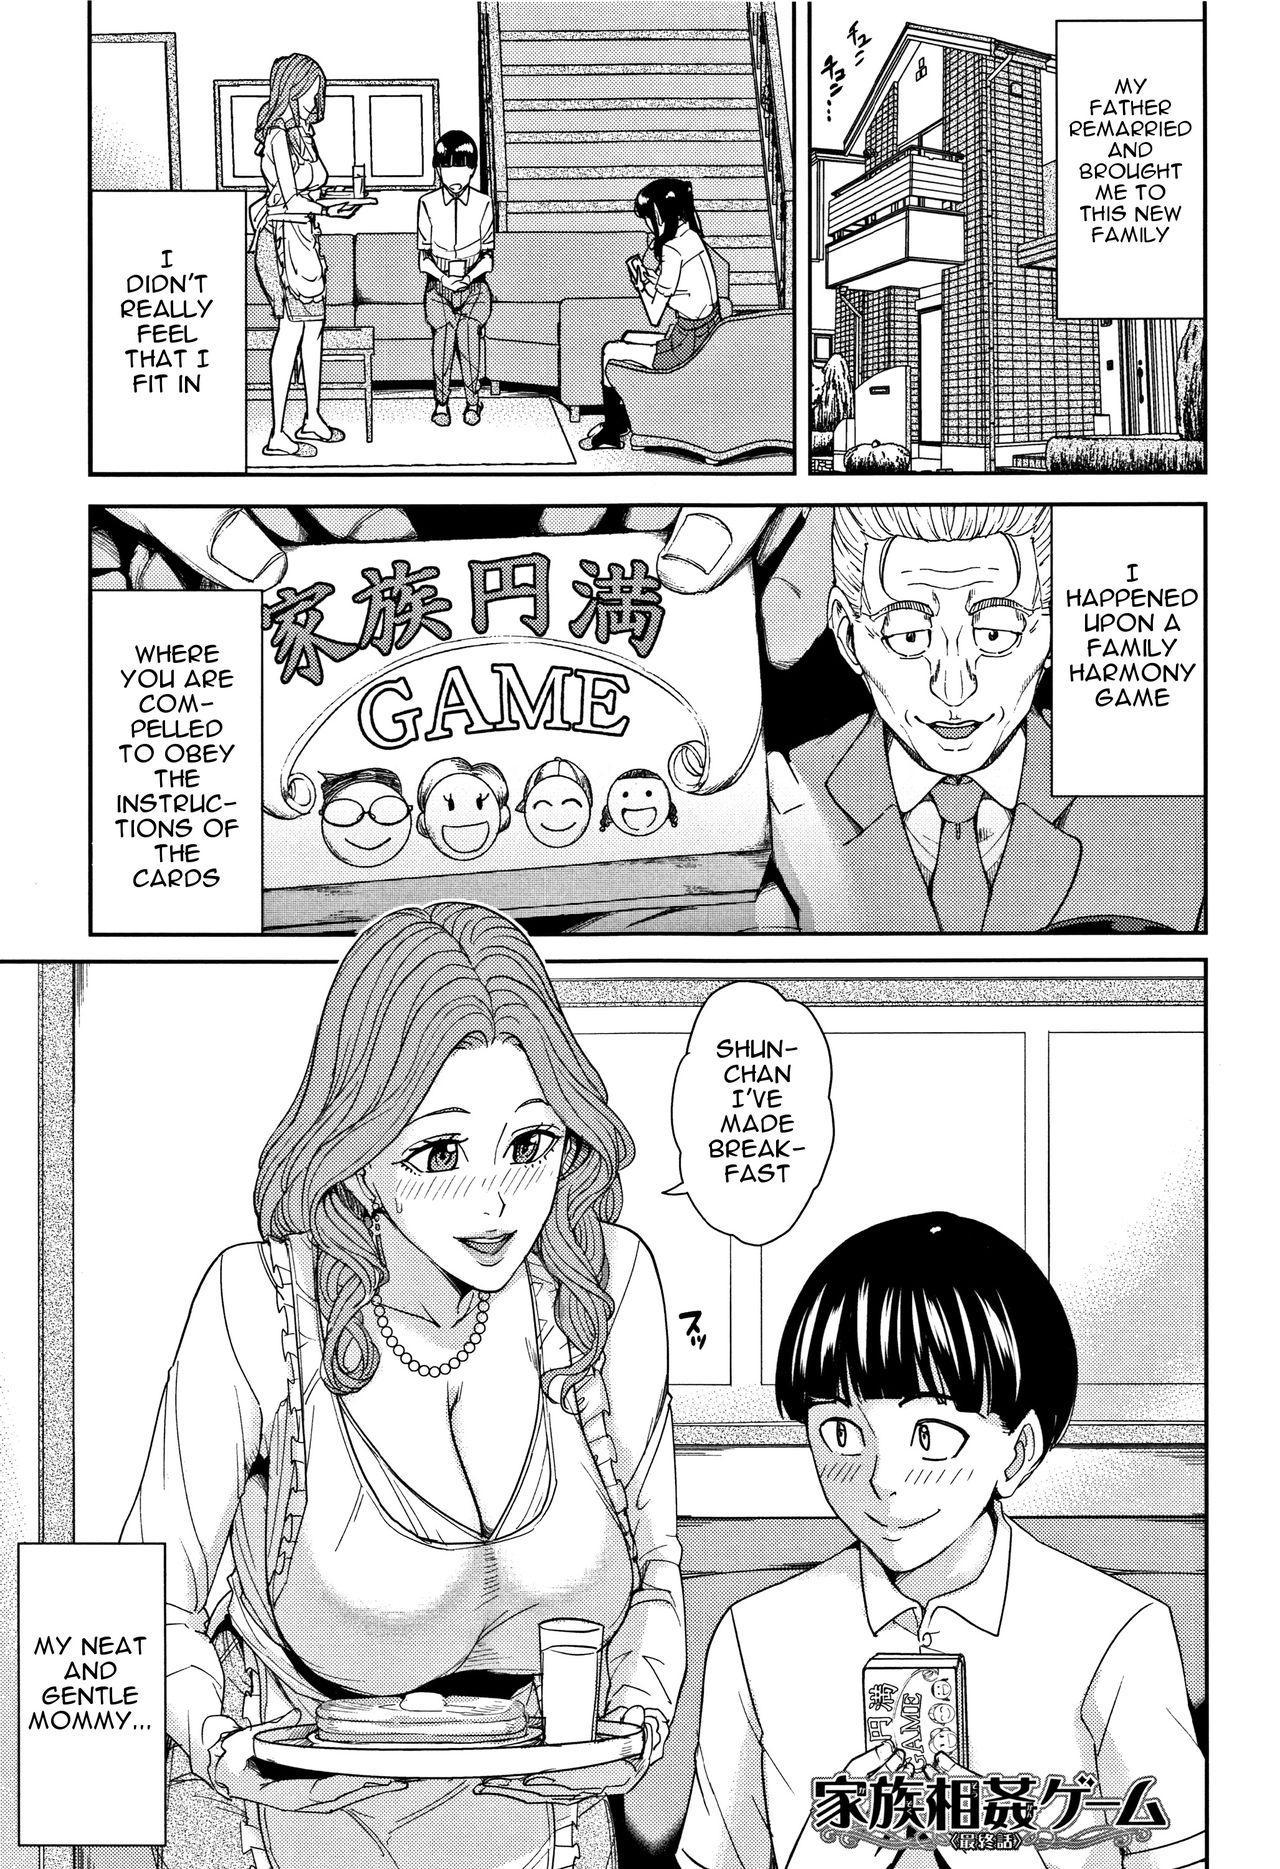 [Maimu-Maimu] Kazoku Soukan Game - family Incest game Ch. 1-3 [English] [Januz] 67